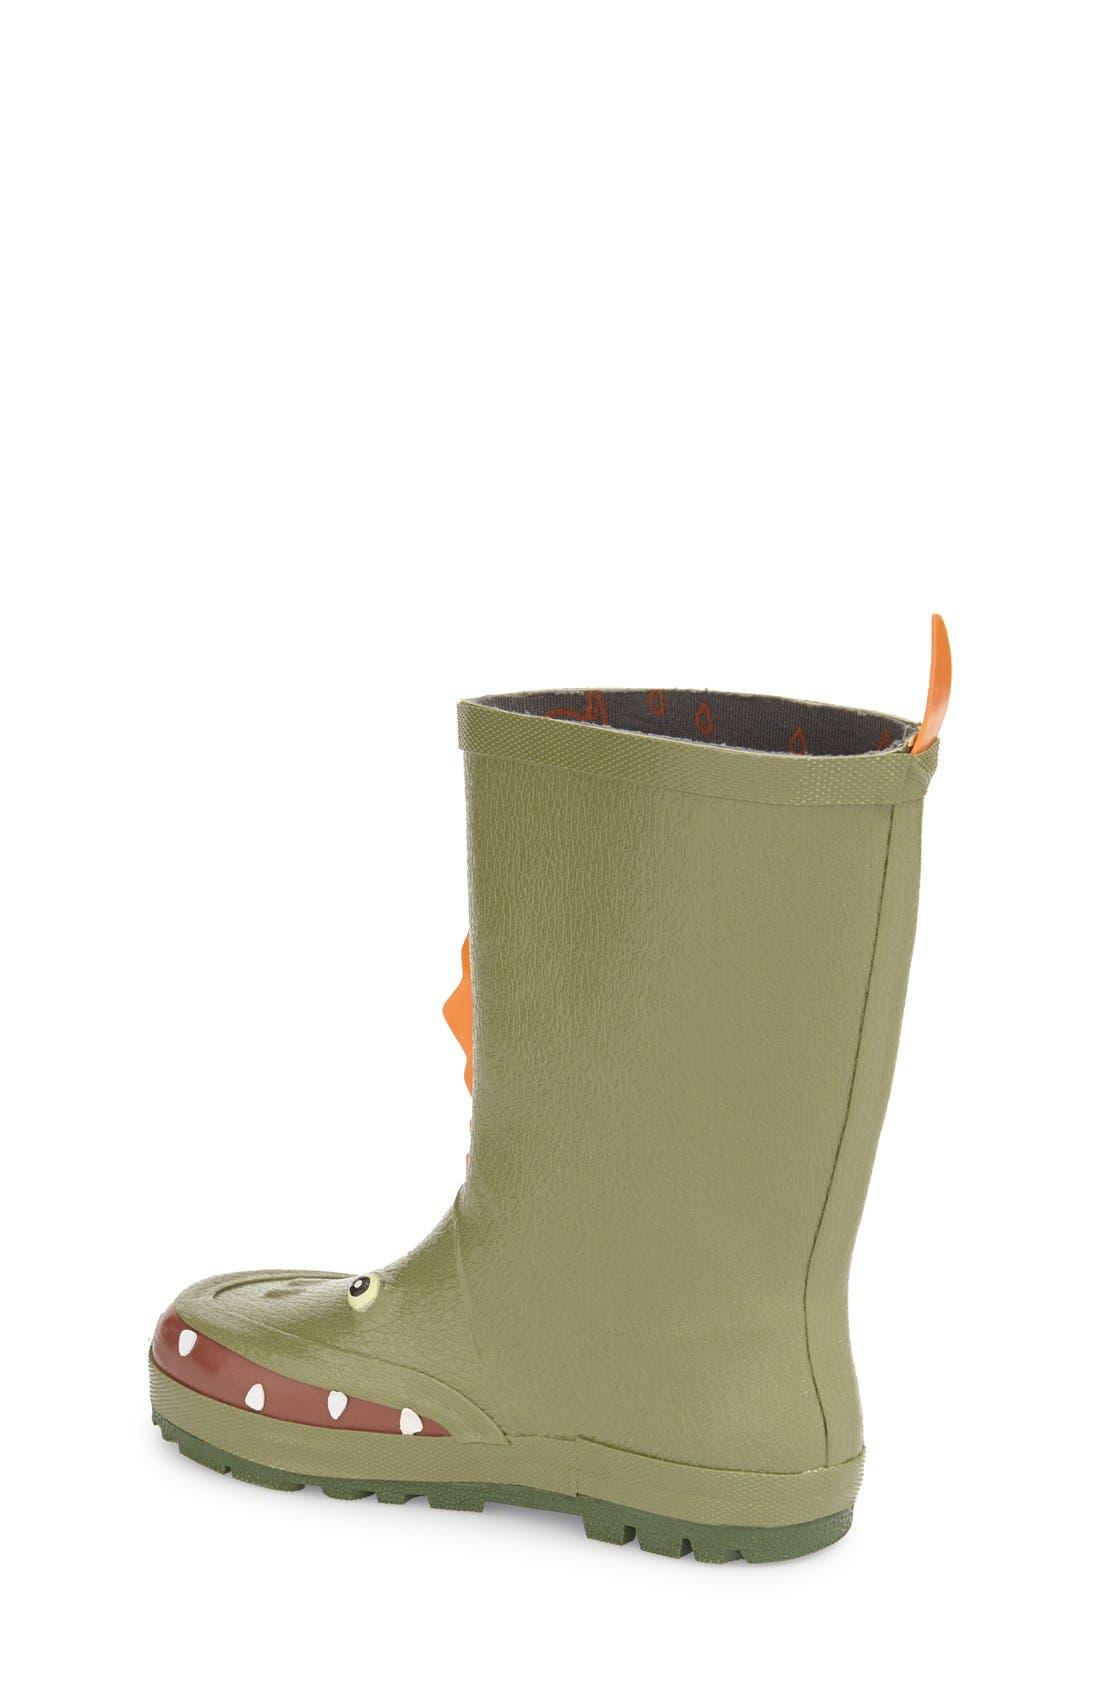 'Dinosaur' Waterproof Rain Boot,                             Alternate thumbnail 2, color,                             300